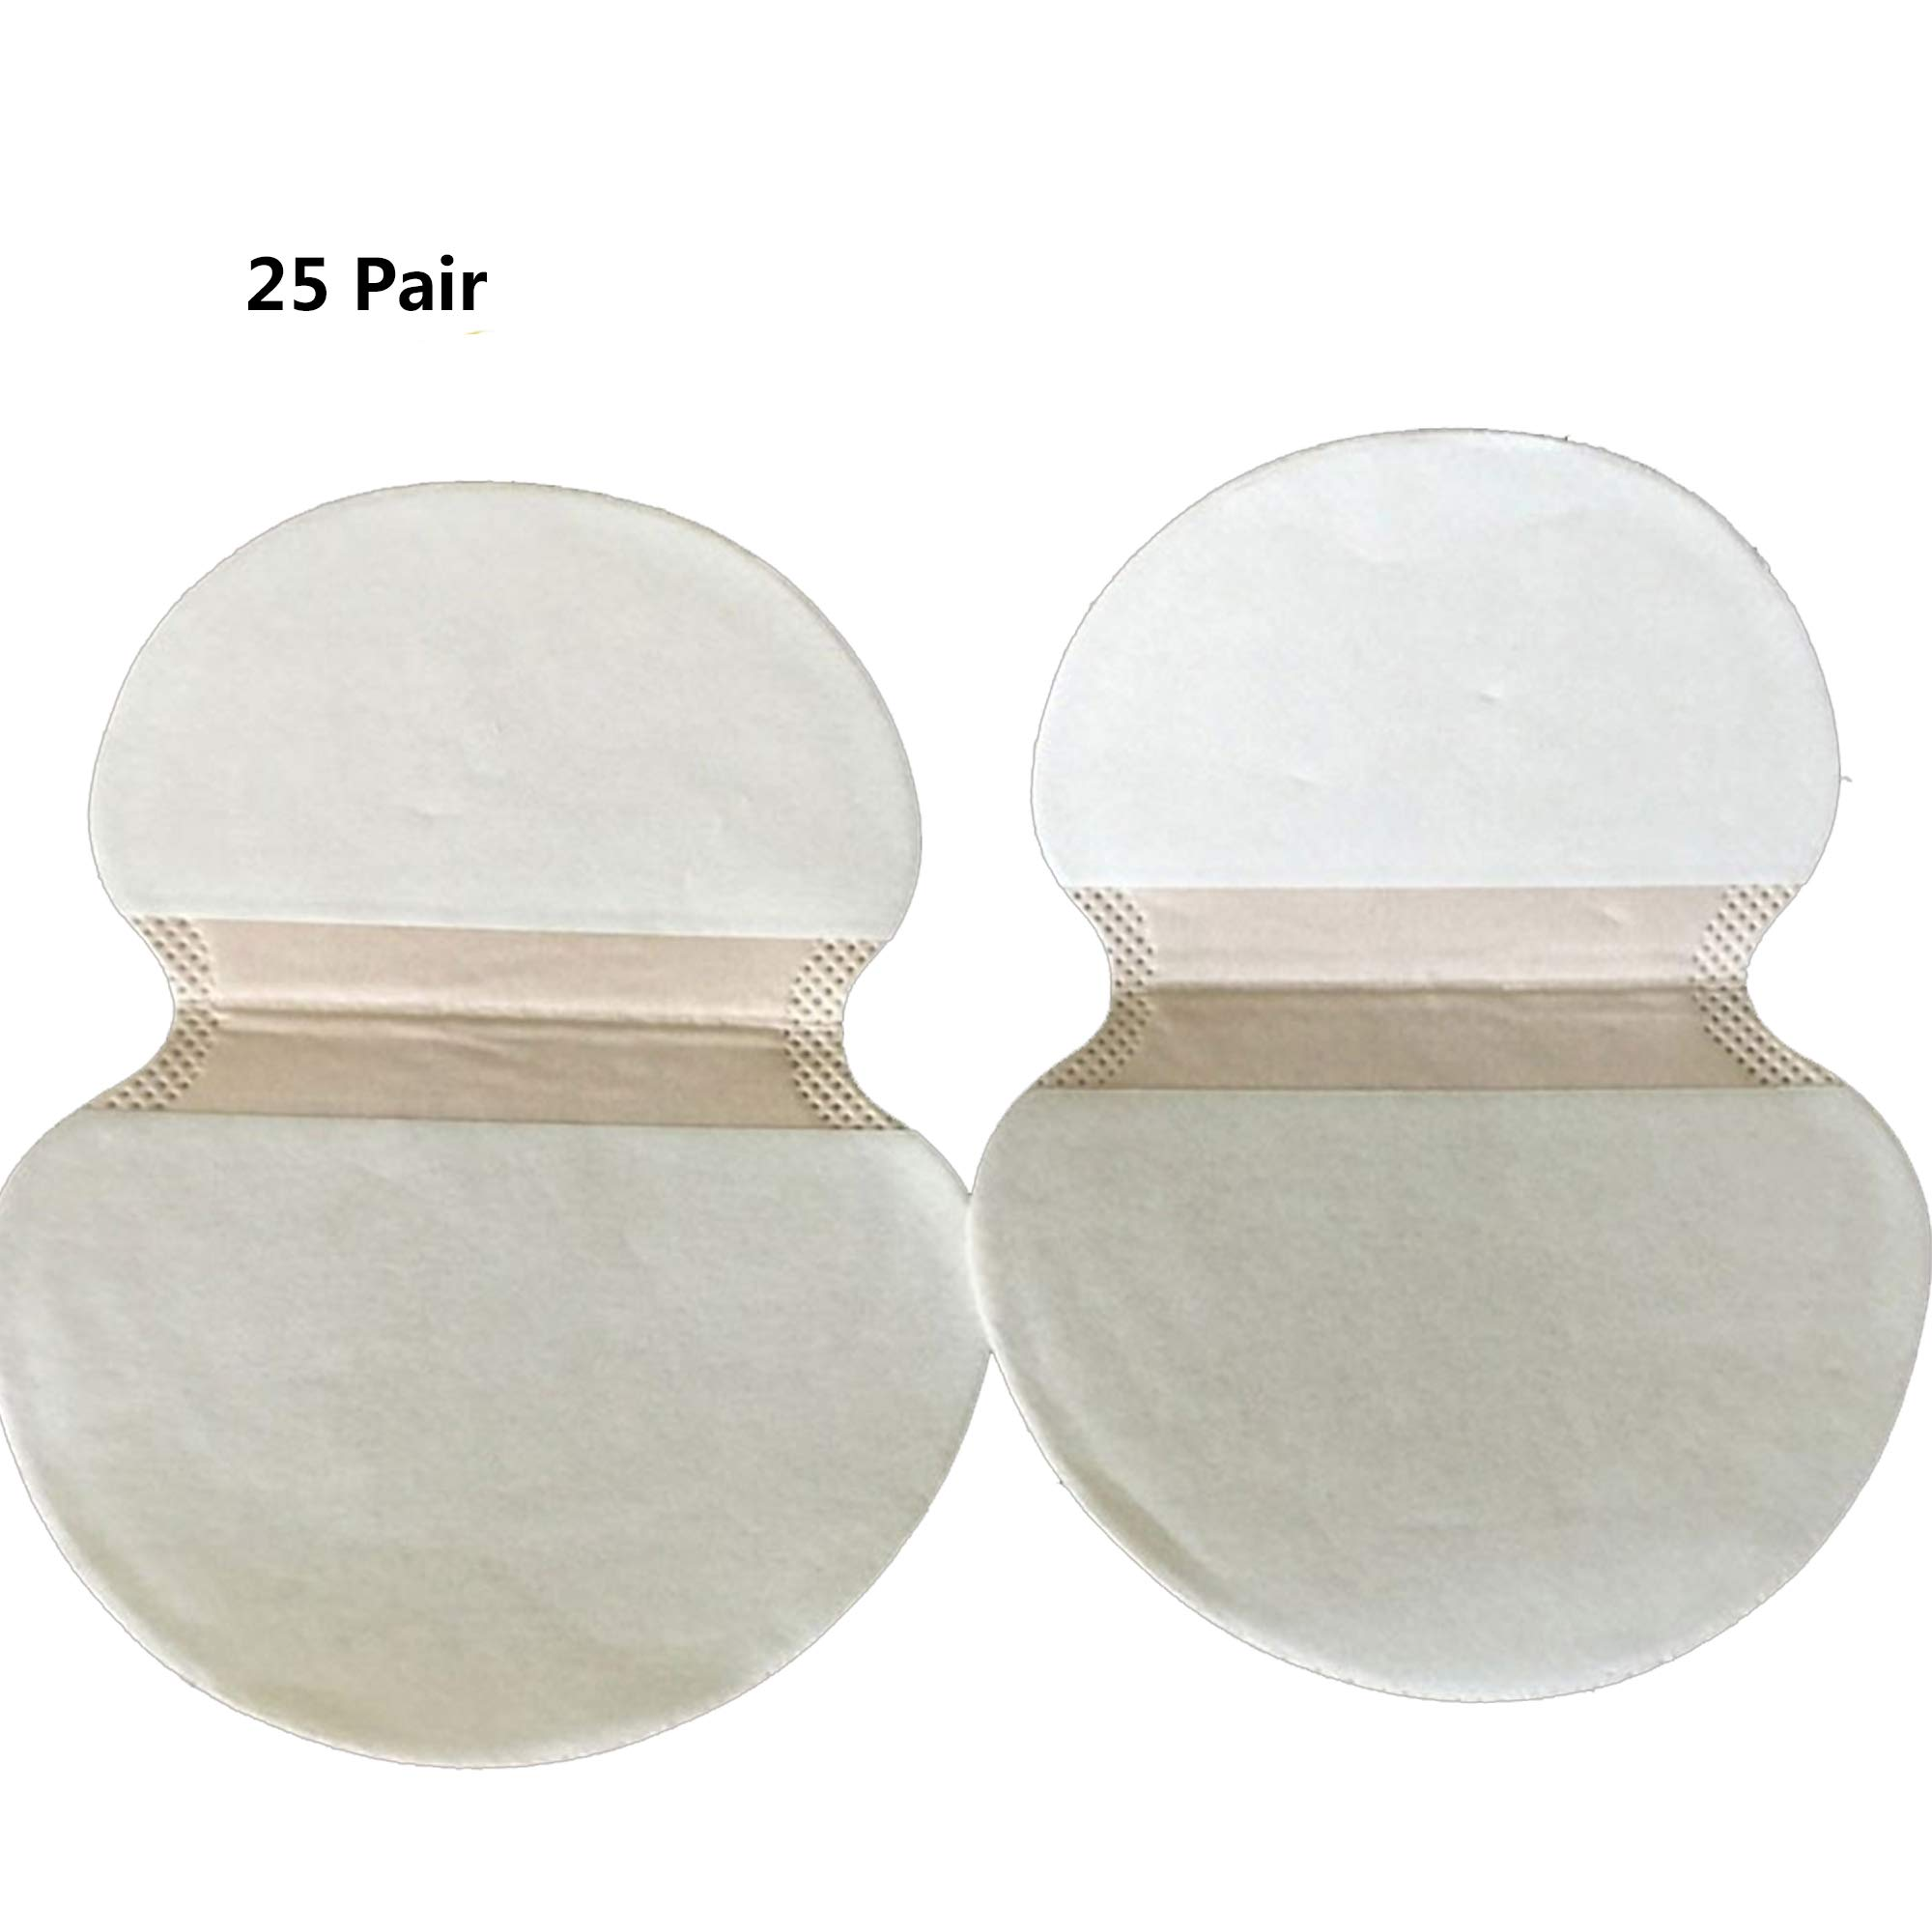 Underarm Sweat Pad, Disposable Absorbent Underarm Shields Antiperspirant Adhesive Underarm Pad Armpit pad Comfortable Discreet Sweat Free Odor Free (25 Pair)